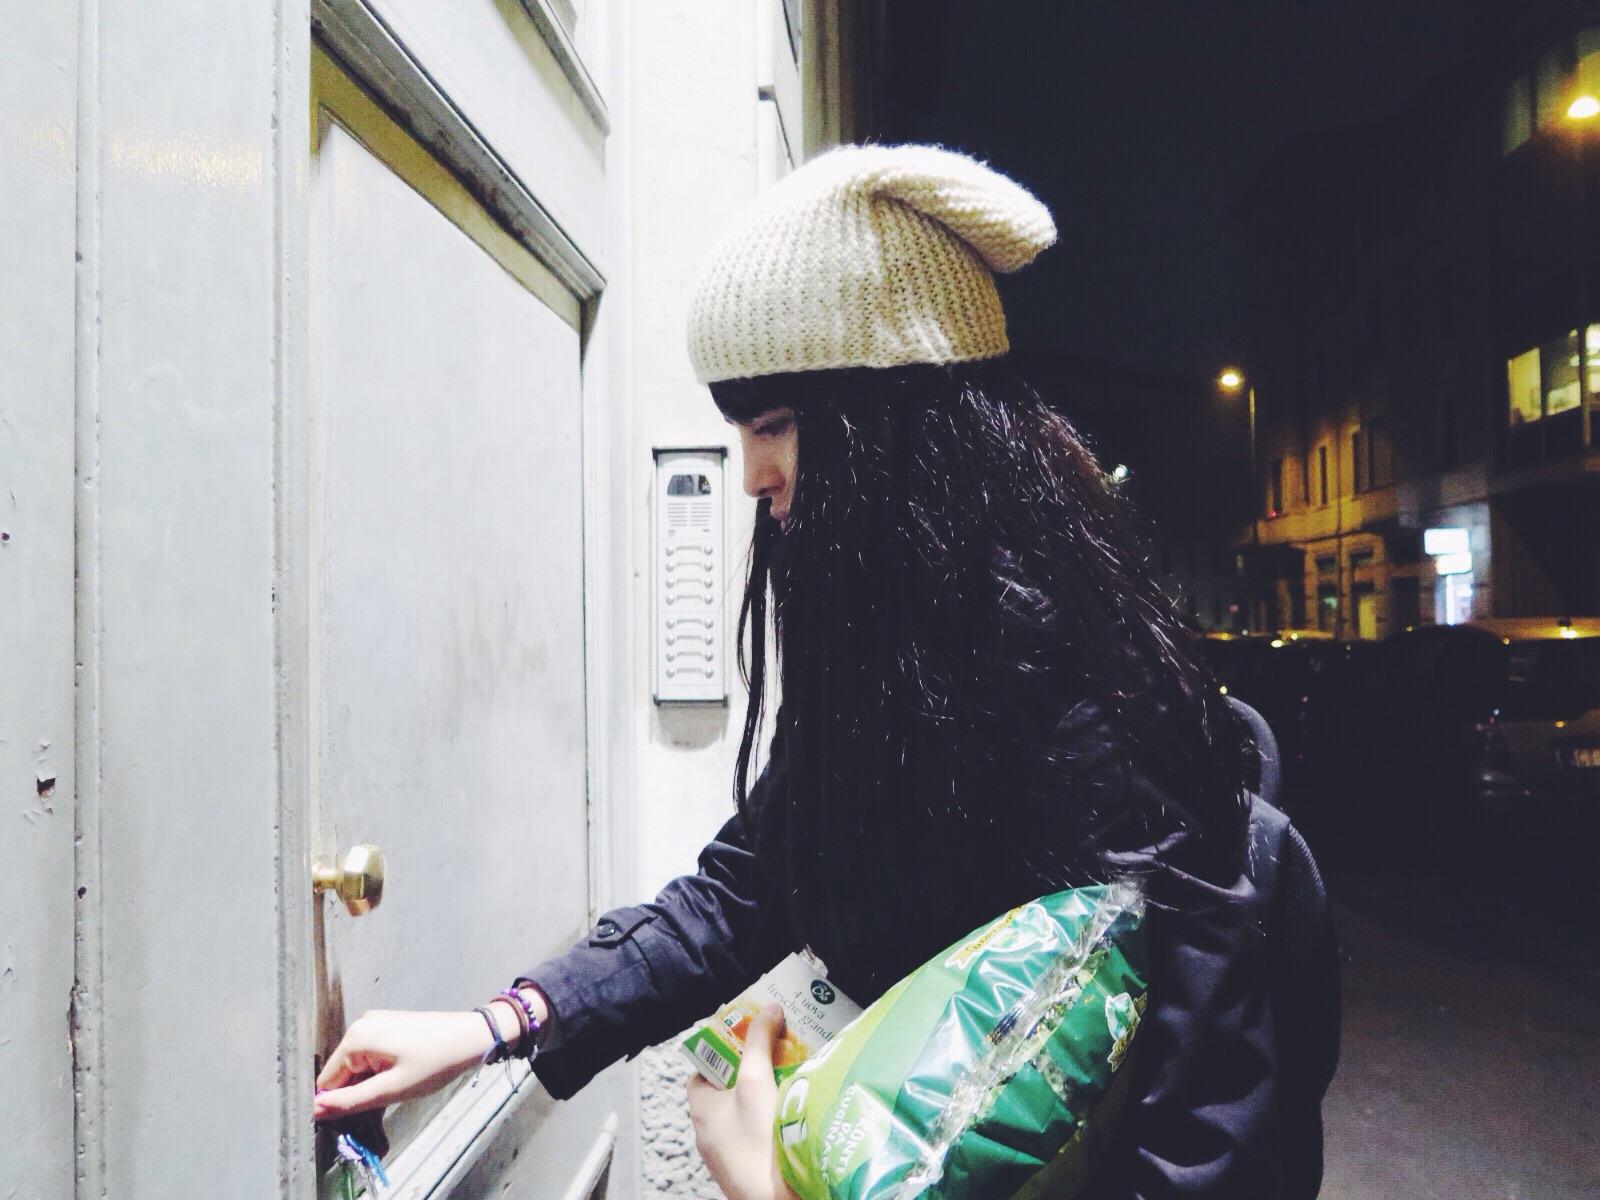 Paloma Dionizio outside her apartment